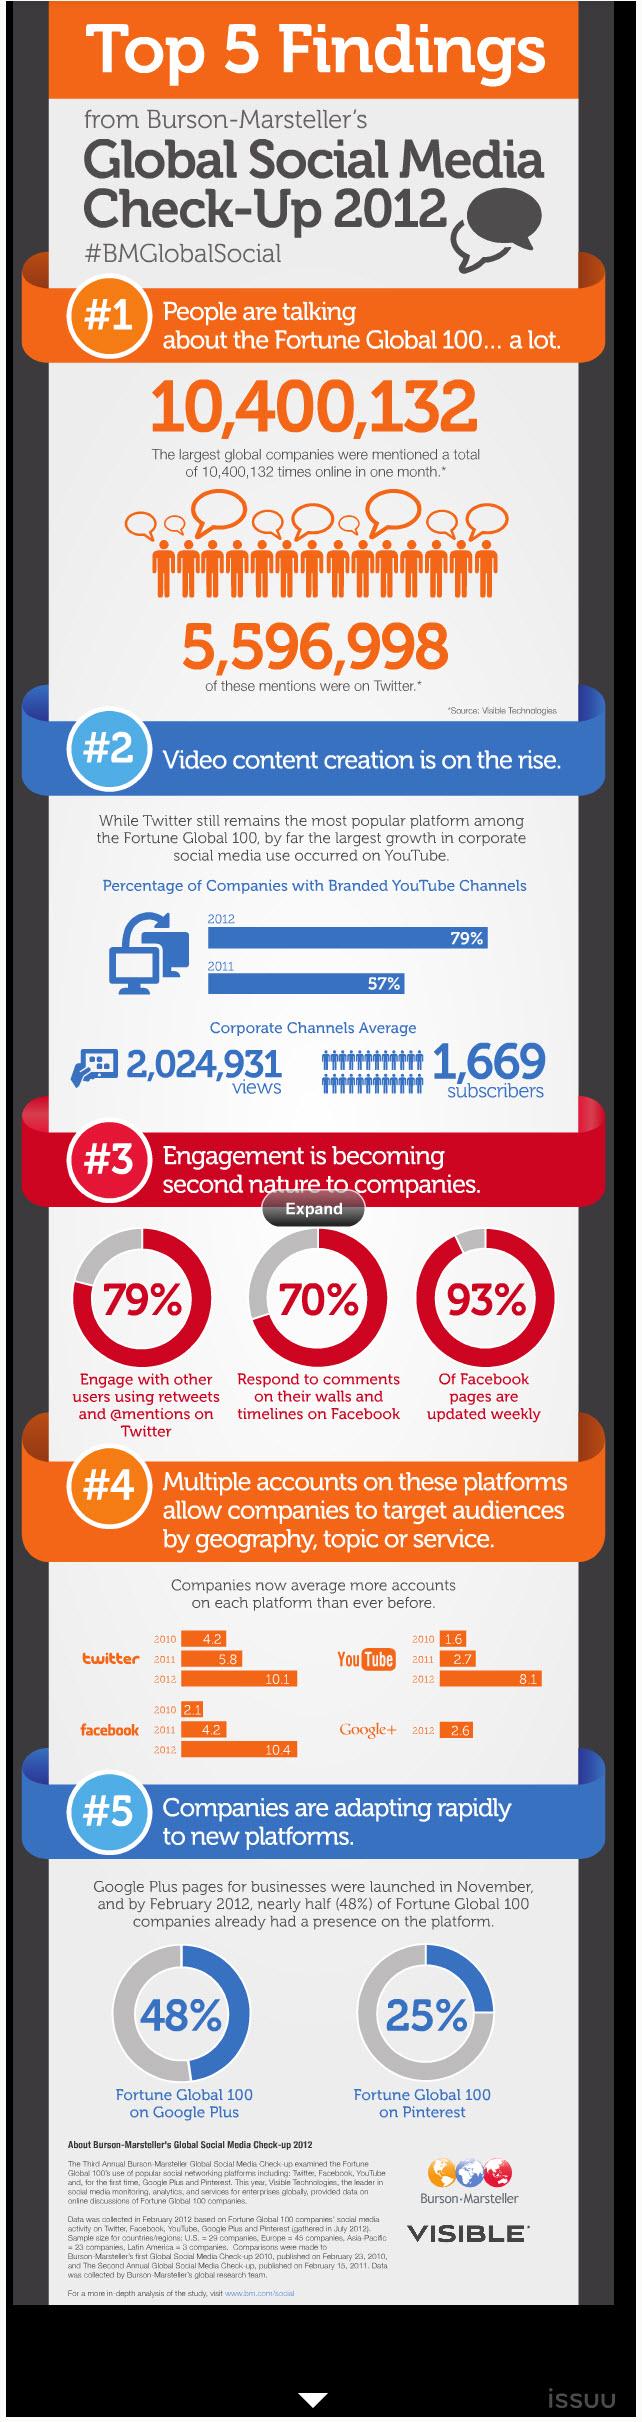 5 Insights into Global Social Media in 2012